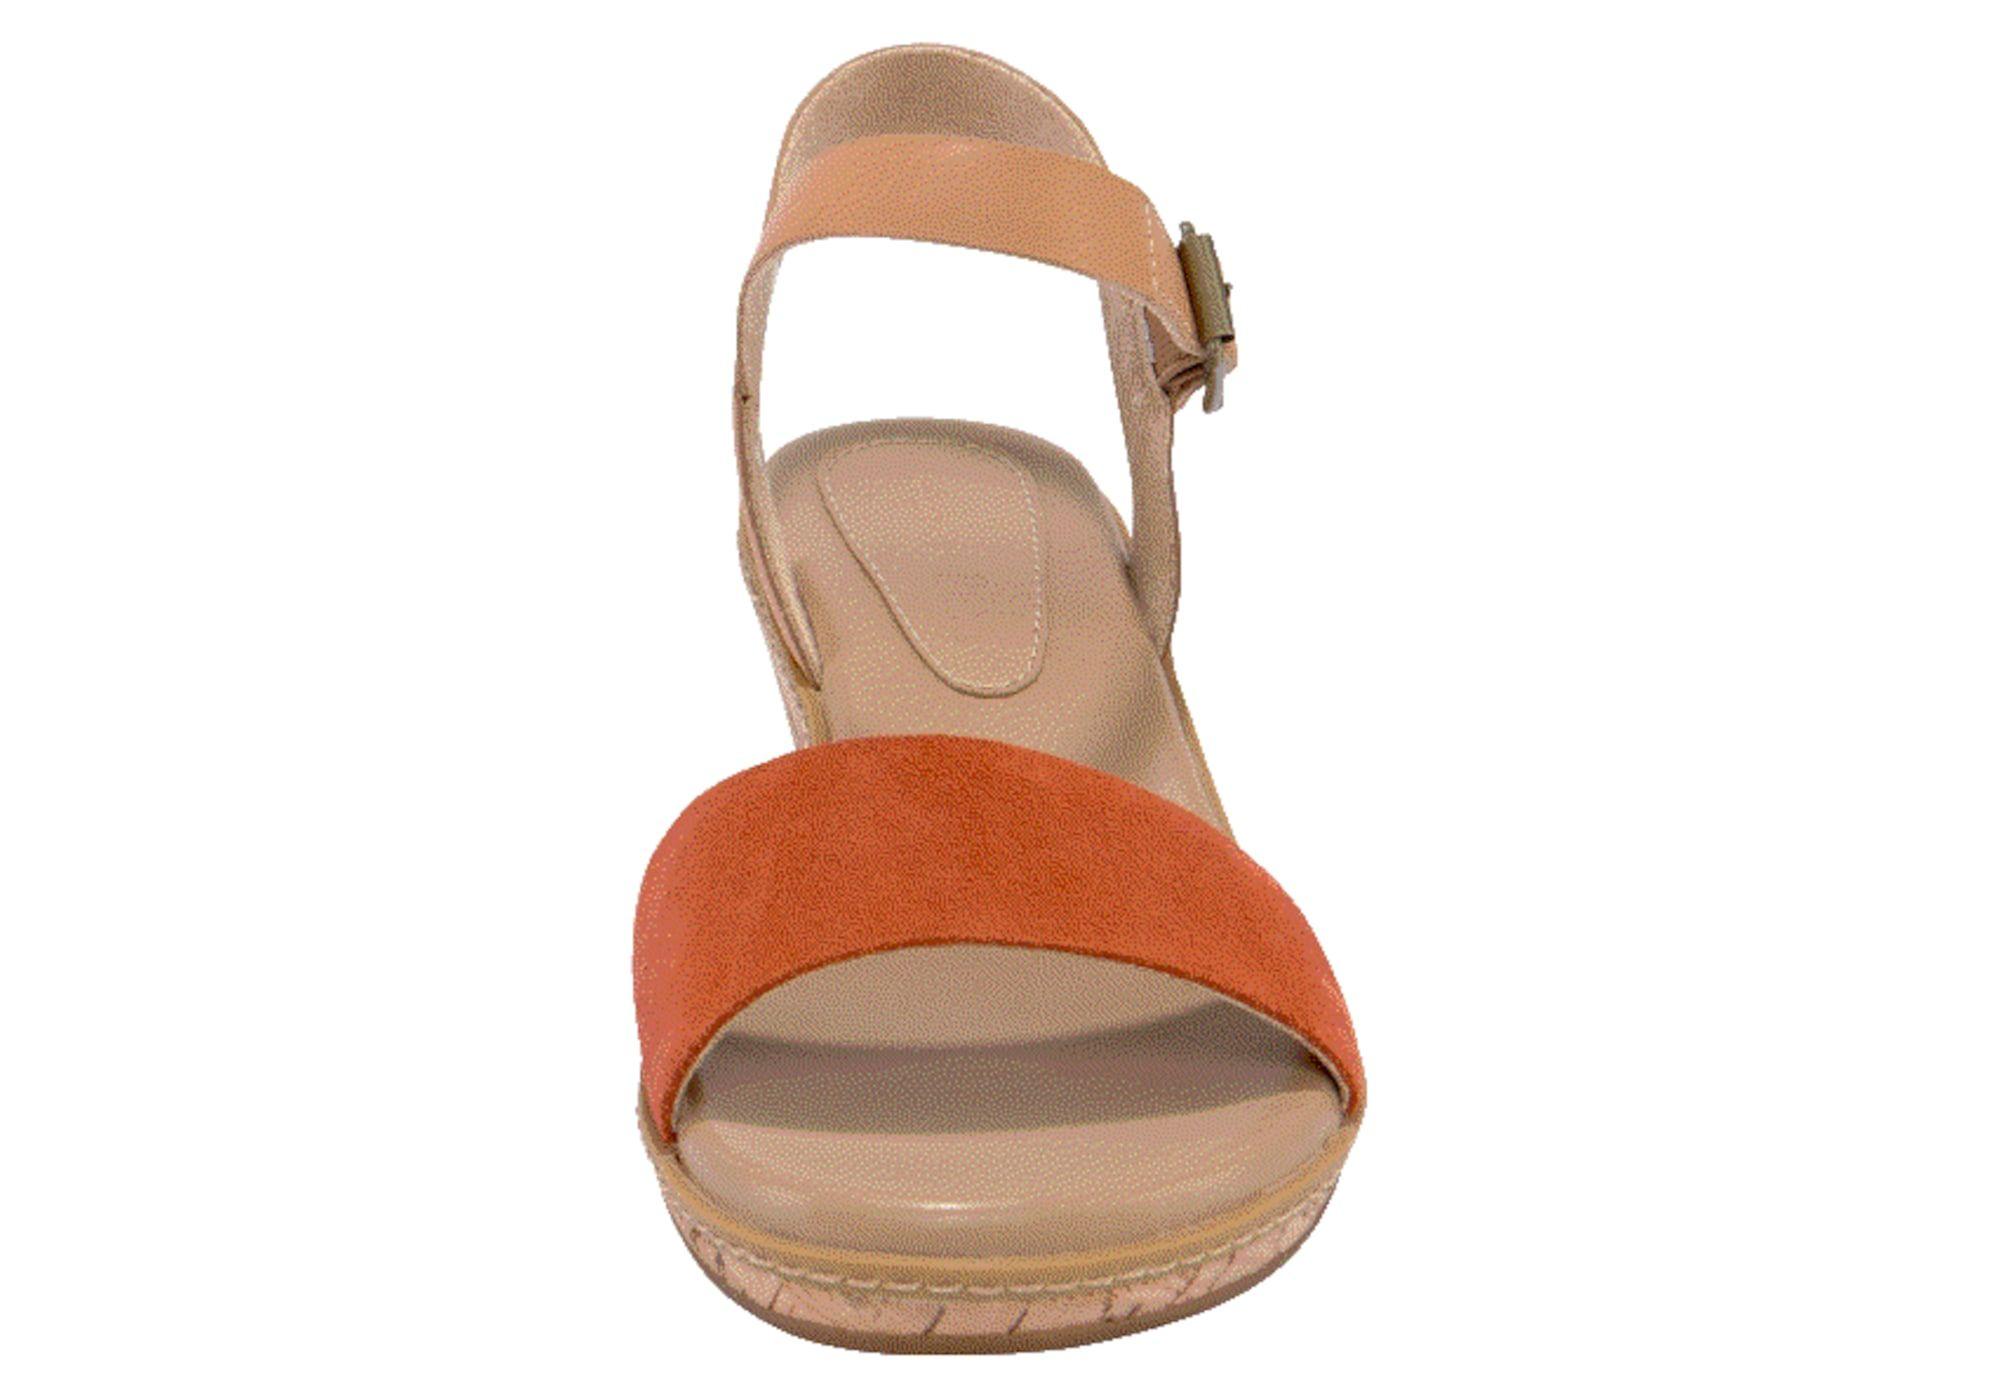 TIMBERLAND Sandale 'Whittier Sandal' Damen, Orangerot, Größe